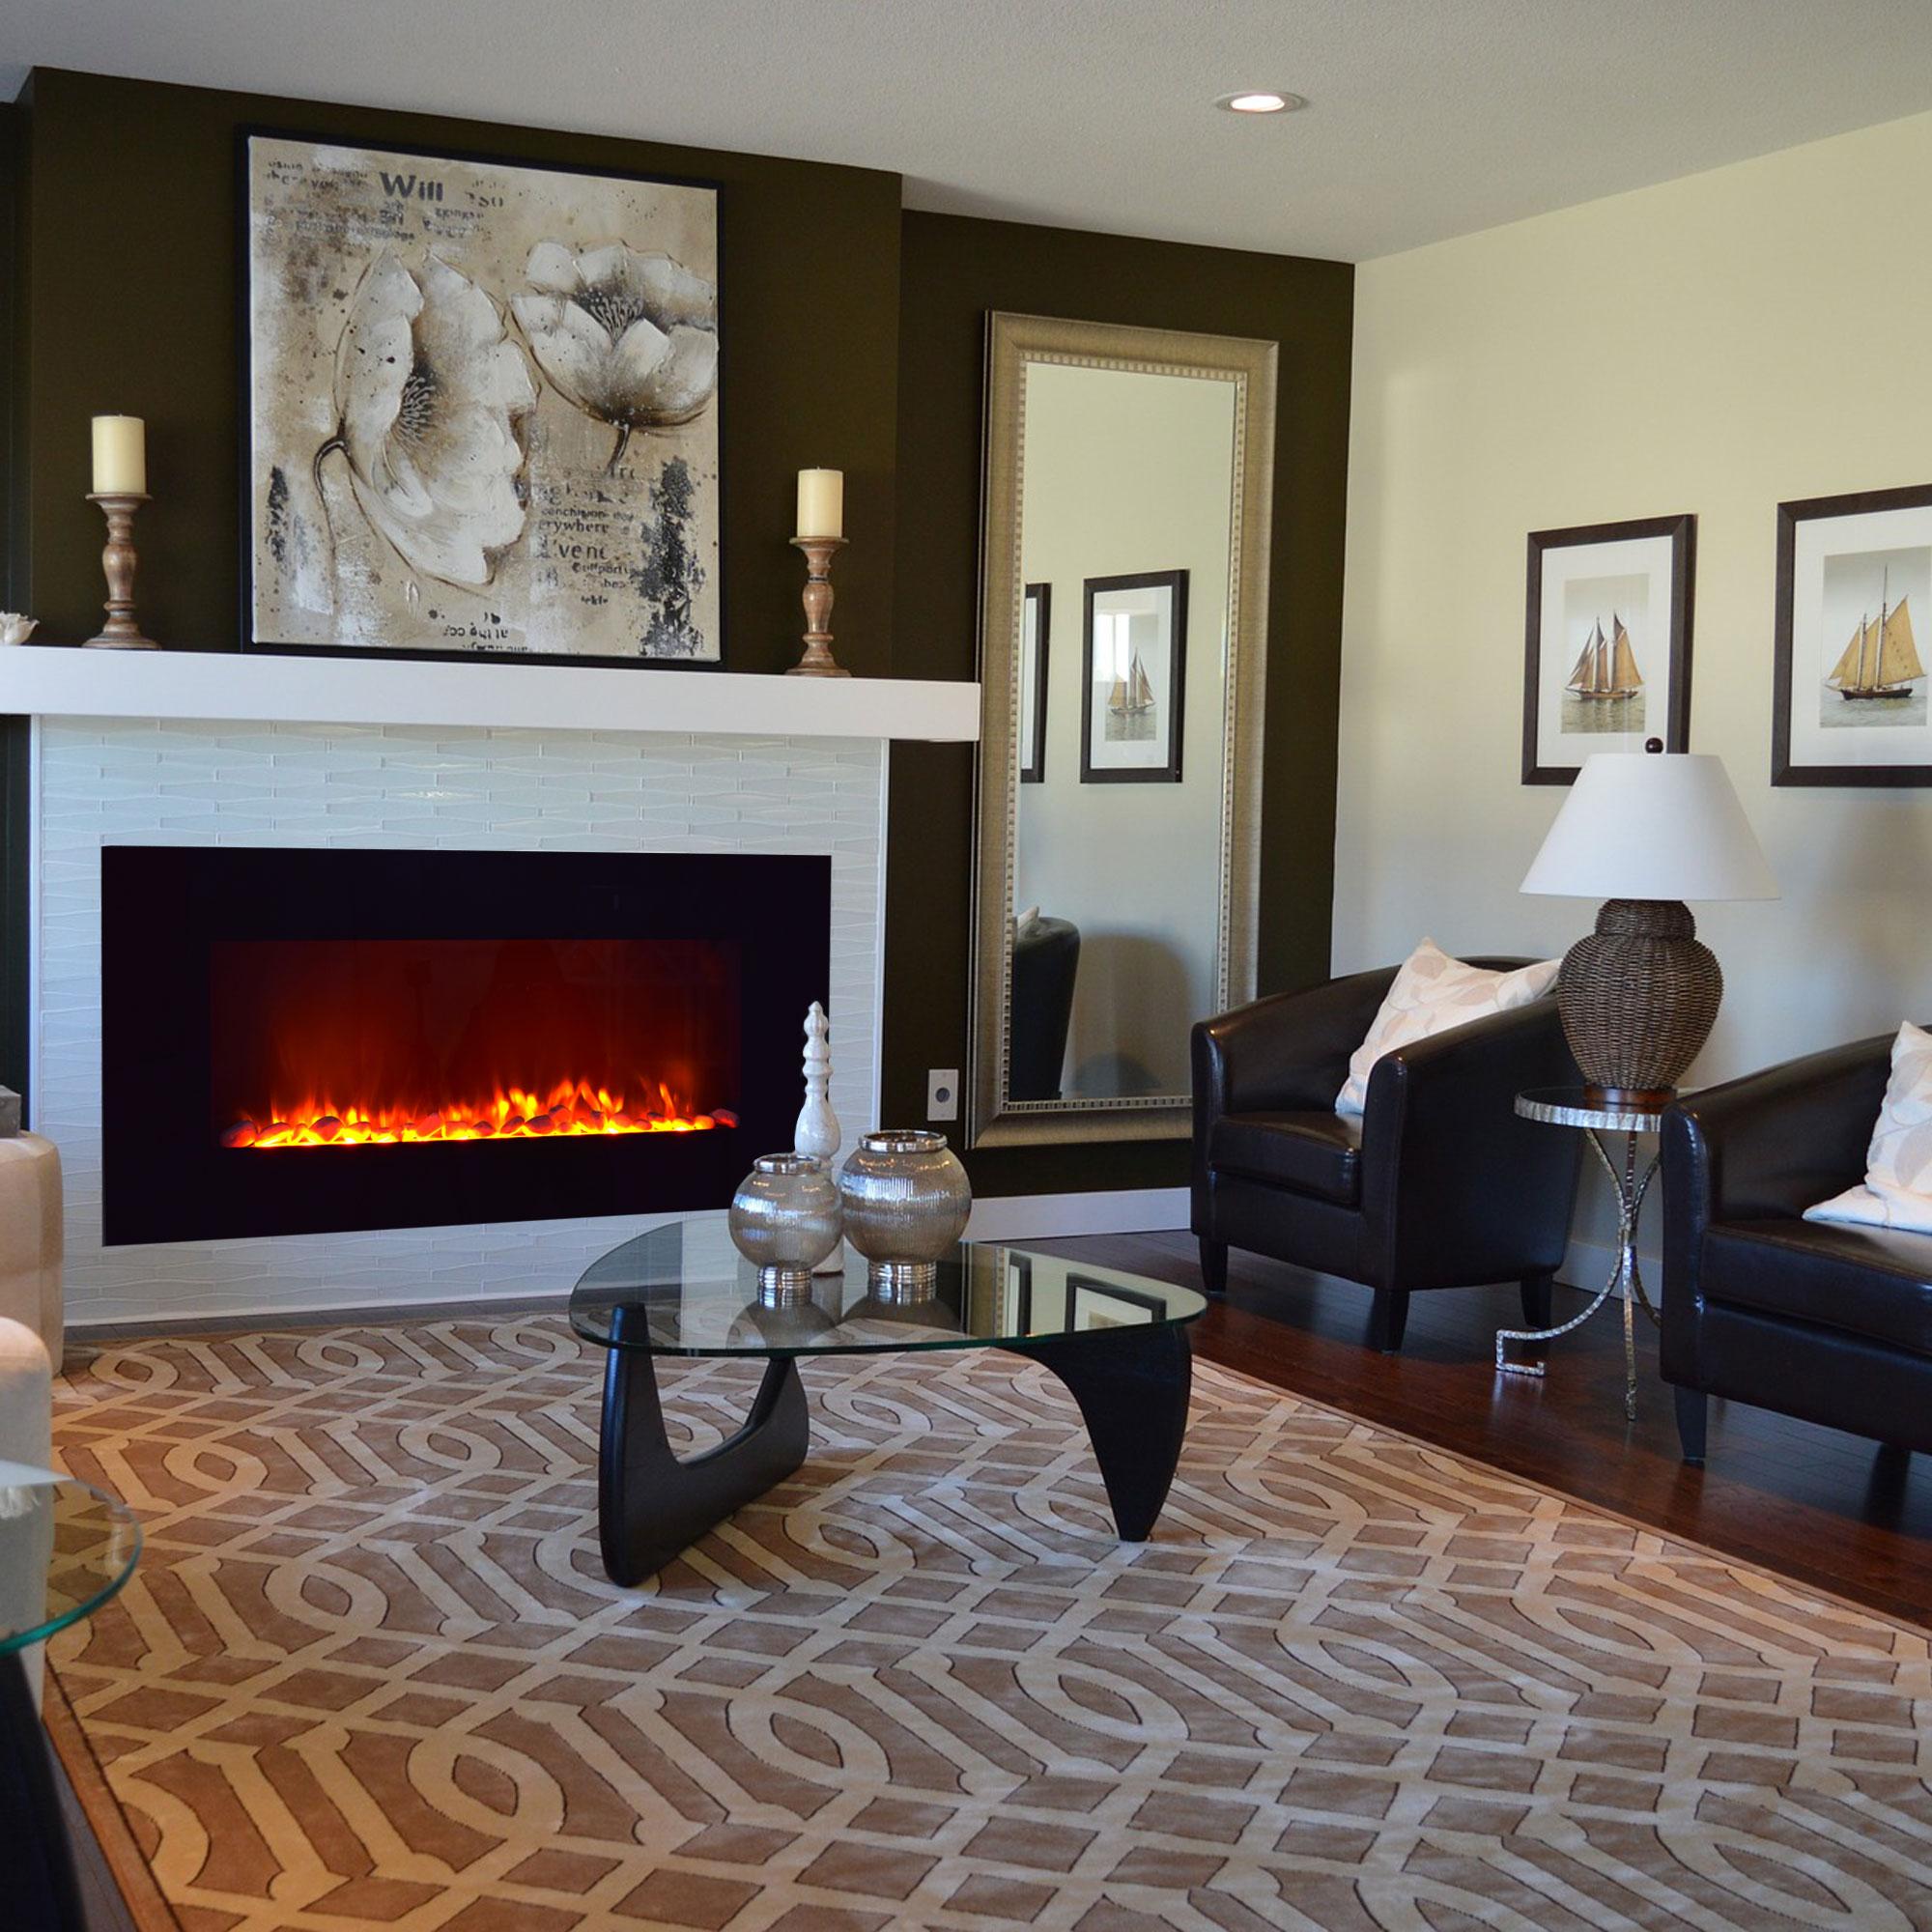 wandkamin mit fernbedienung elektrokamin schwarz nova syntrox ebay. Black Bedroom Furniture Sets. Home Design Ideas